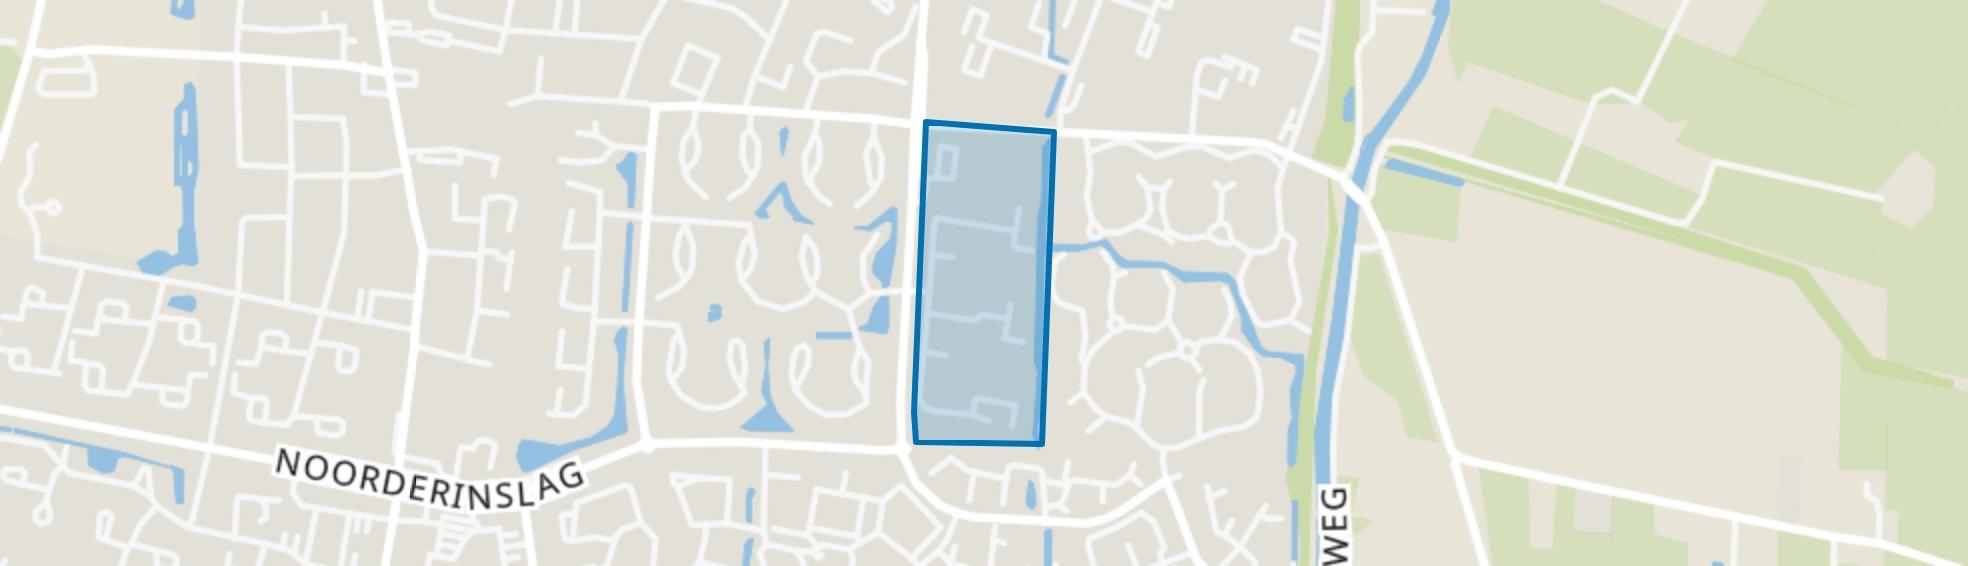 Alandsbeek-West, Leusden map